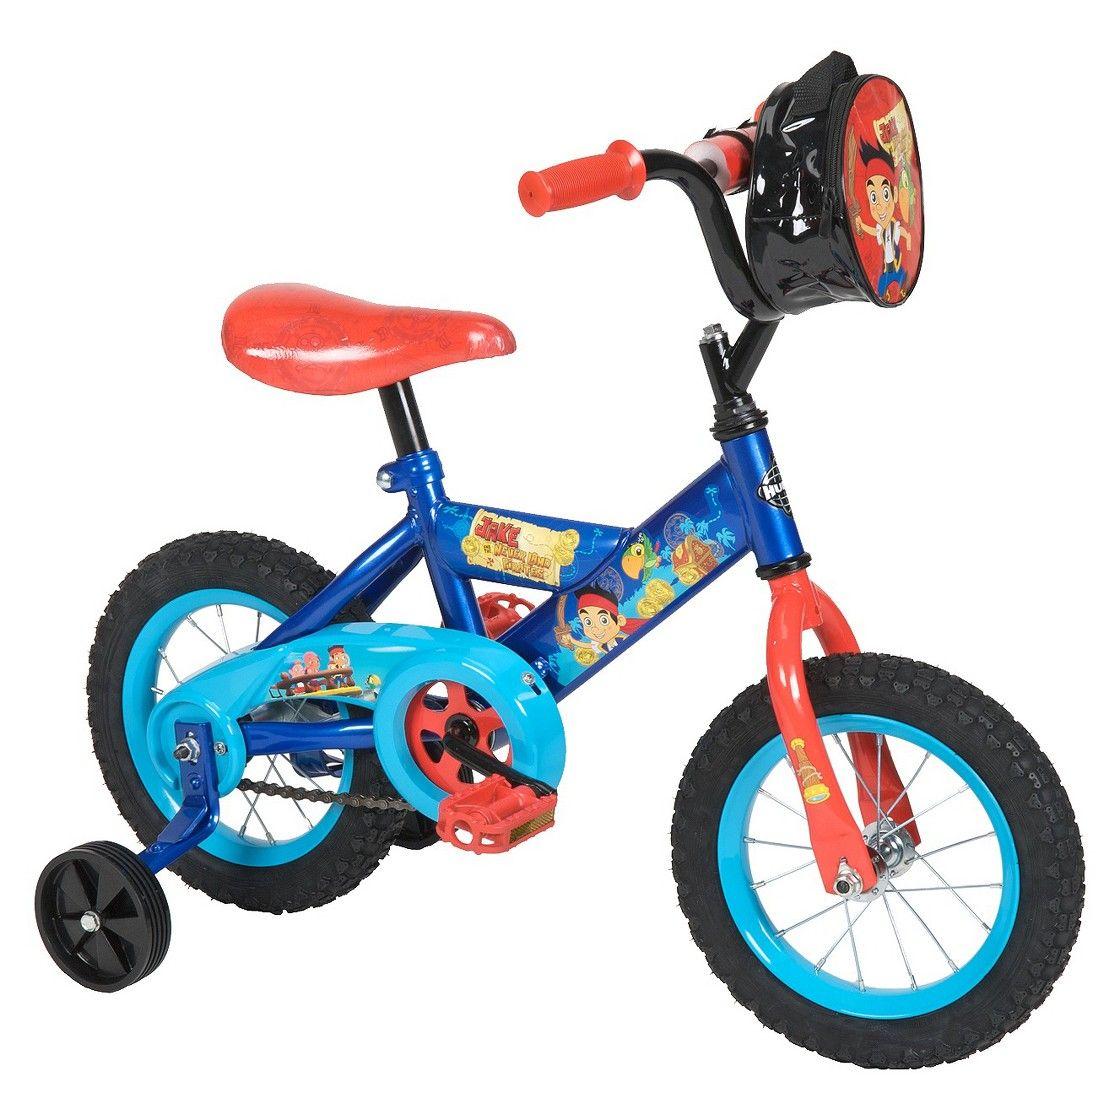 "Huffy Disney Jake and the Neverland Pirates 12"" Boys Bike"